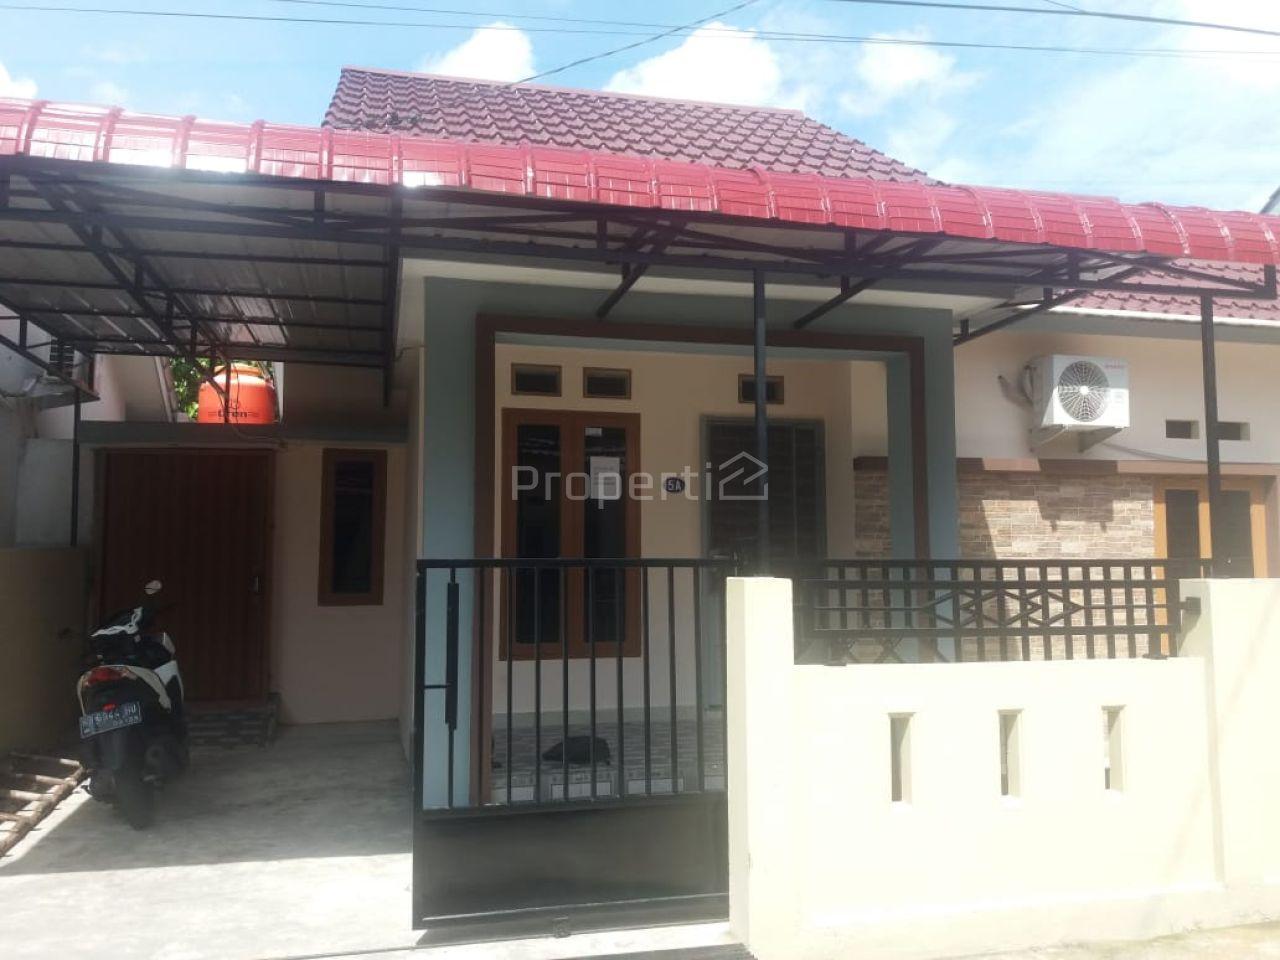 New House at Kota Baru, Pontianak City, Kalimantan Barat